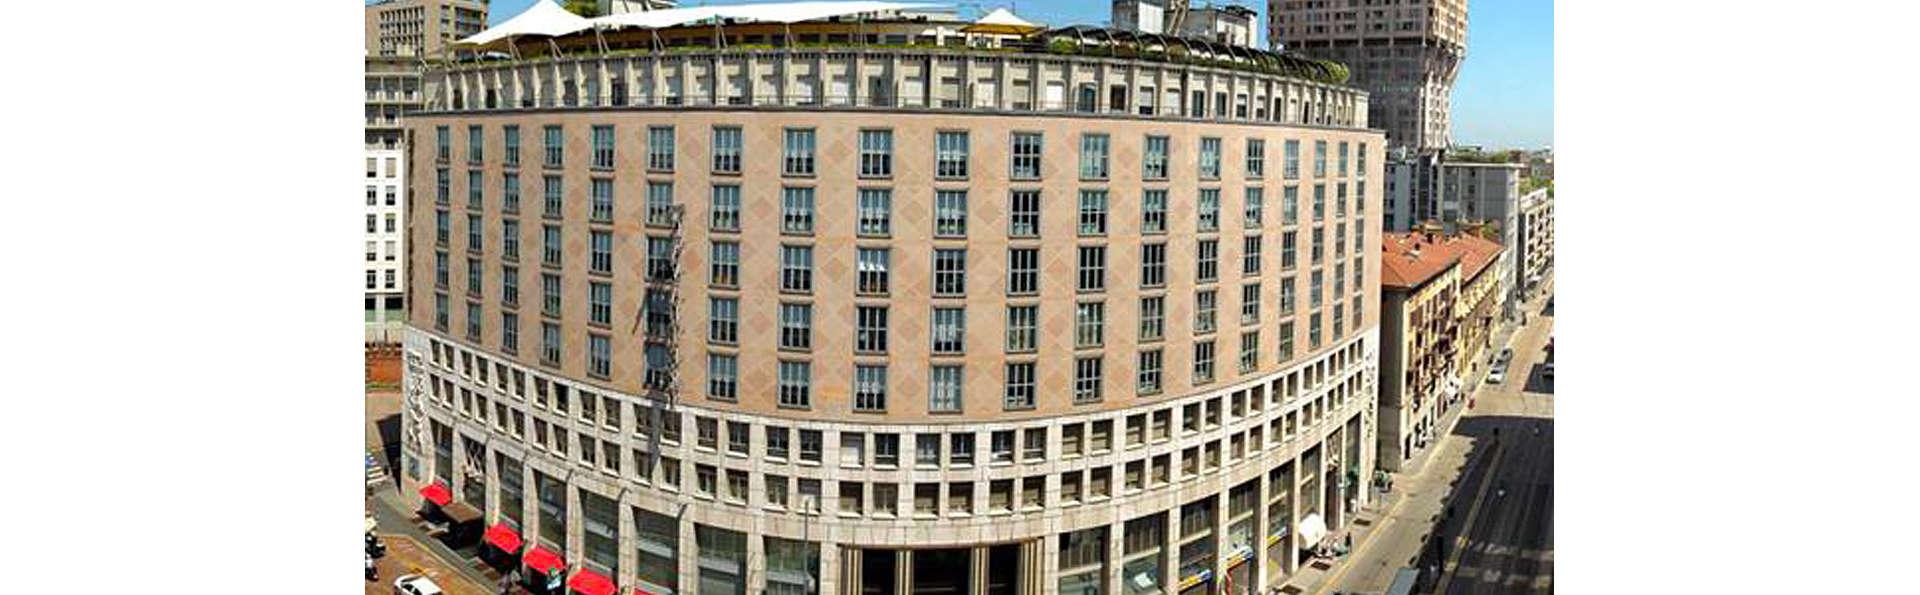 Hotel dei Cavalieri - EDIT_FRONT_01.jpg